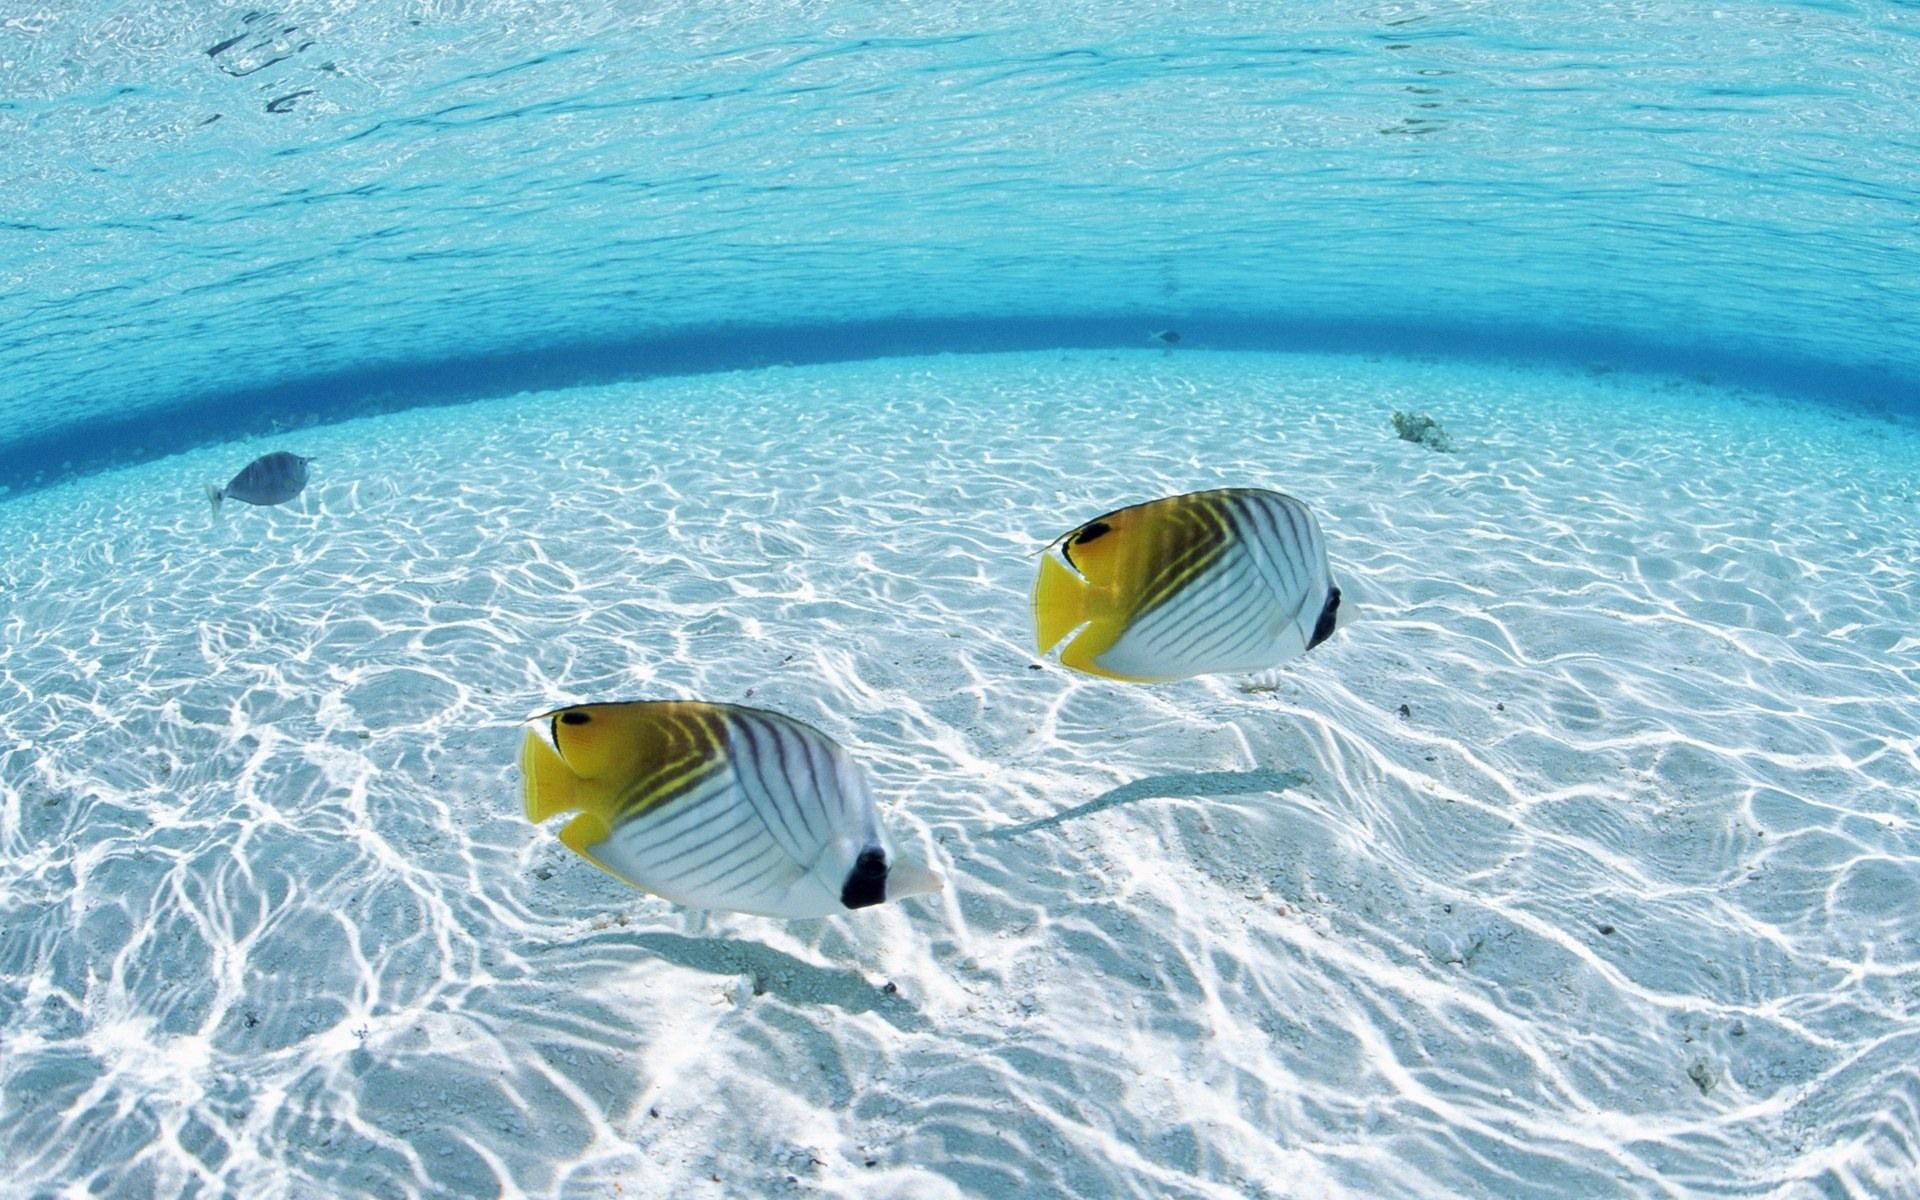 … pretty ocean wallpapers on kubipet com …